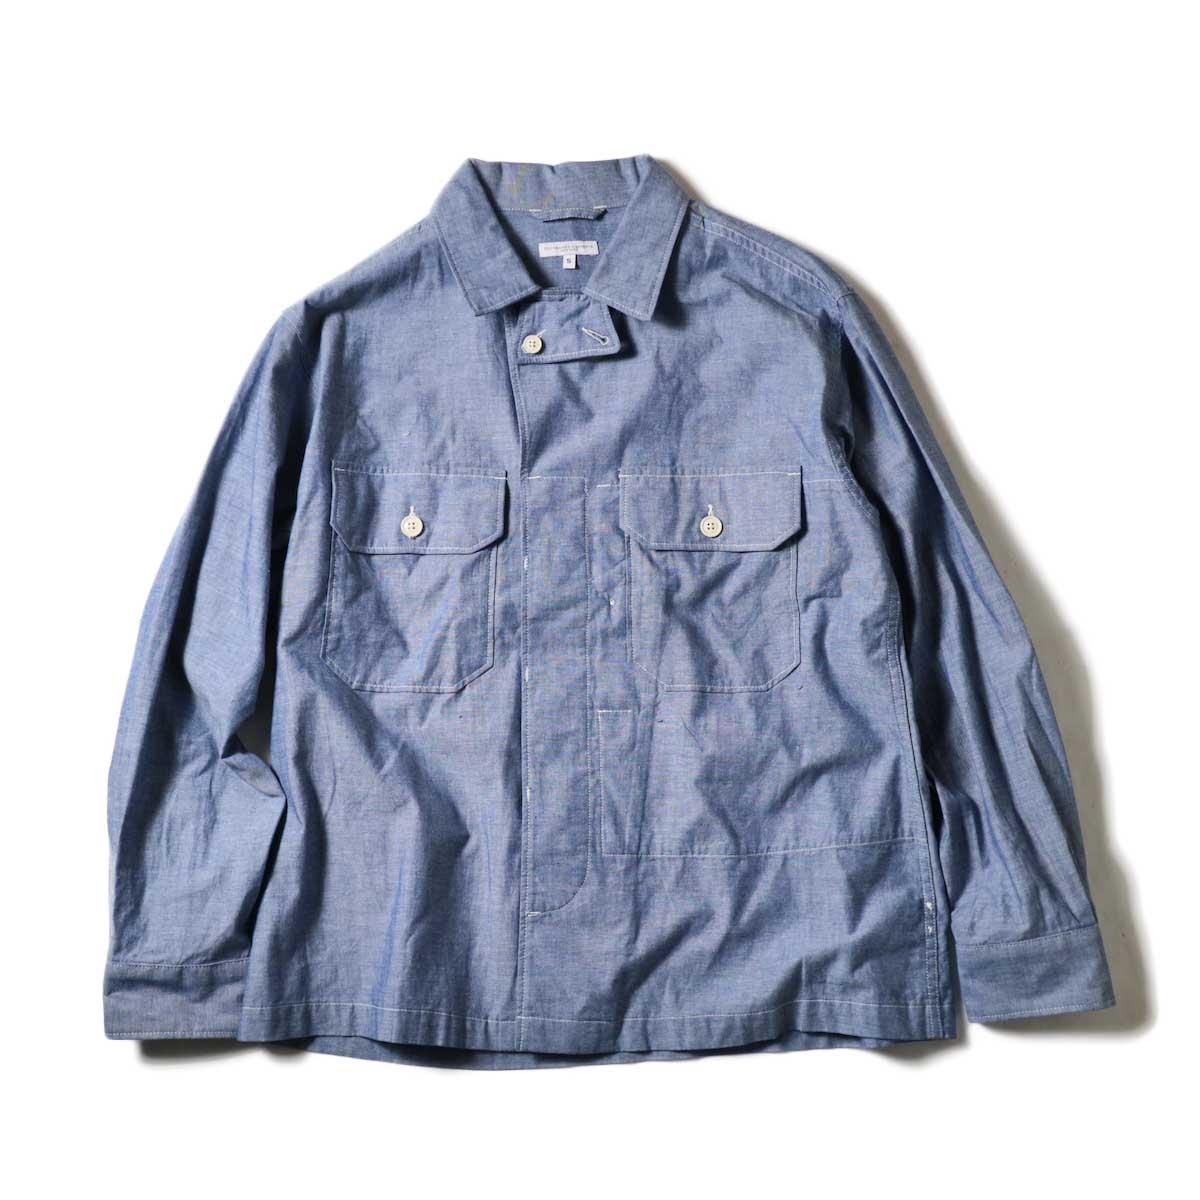 Engineered Garments / MC Shirt Jacket -Cotton Chambray (Blue)